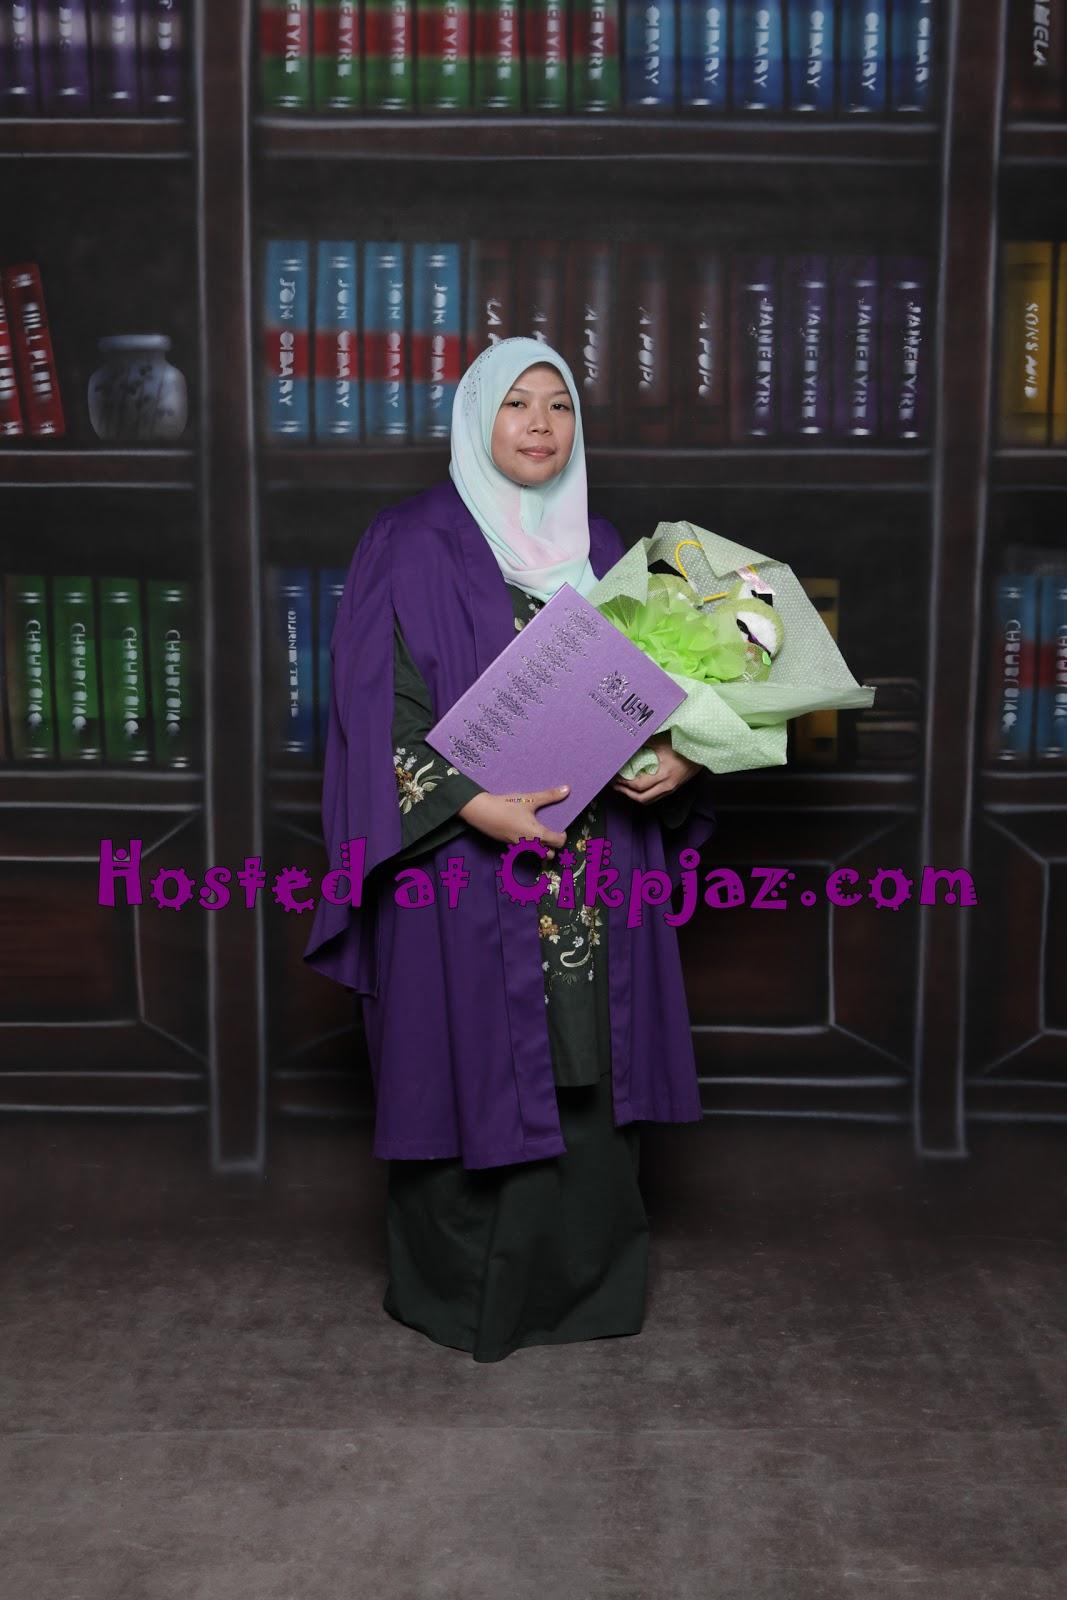 Selesai Sudah Konvo Sidang Ke 46 Universiti Sains Malaysia 2012